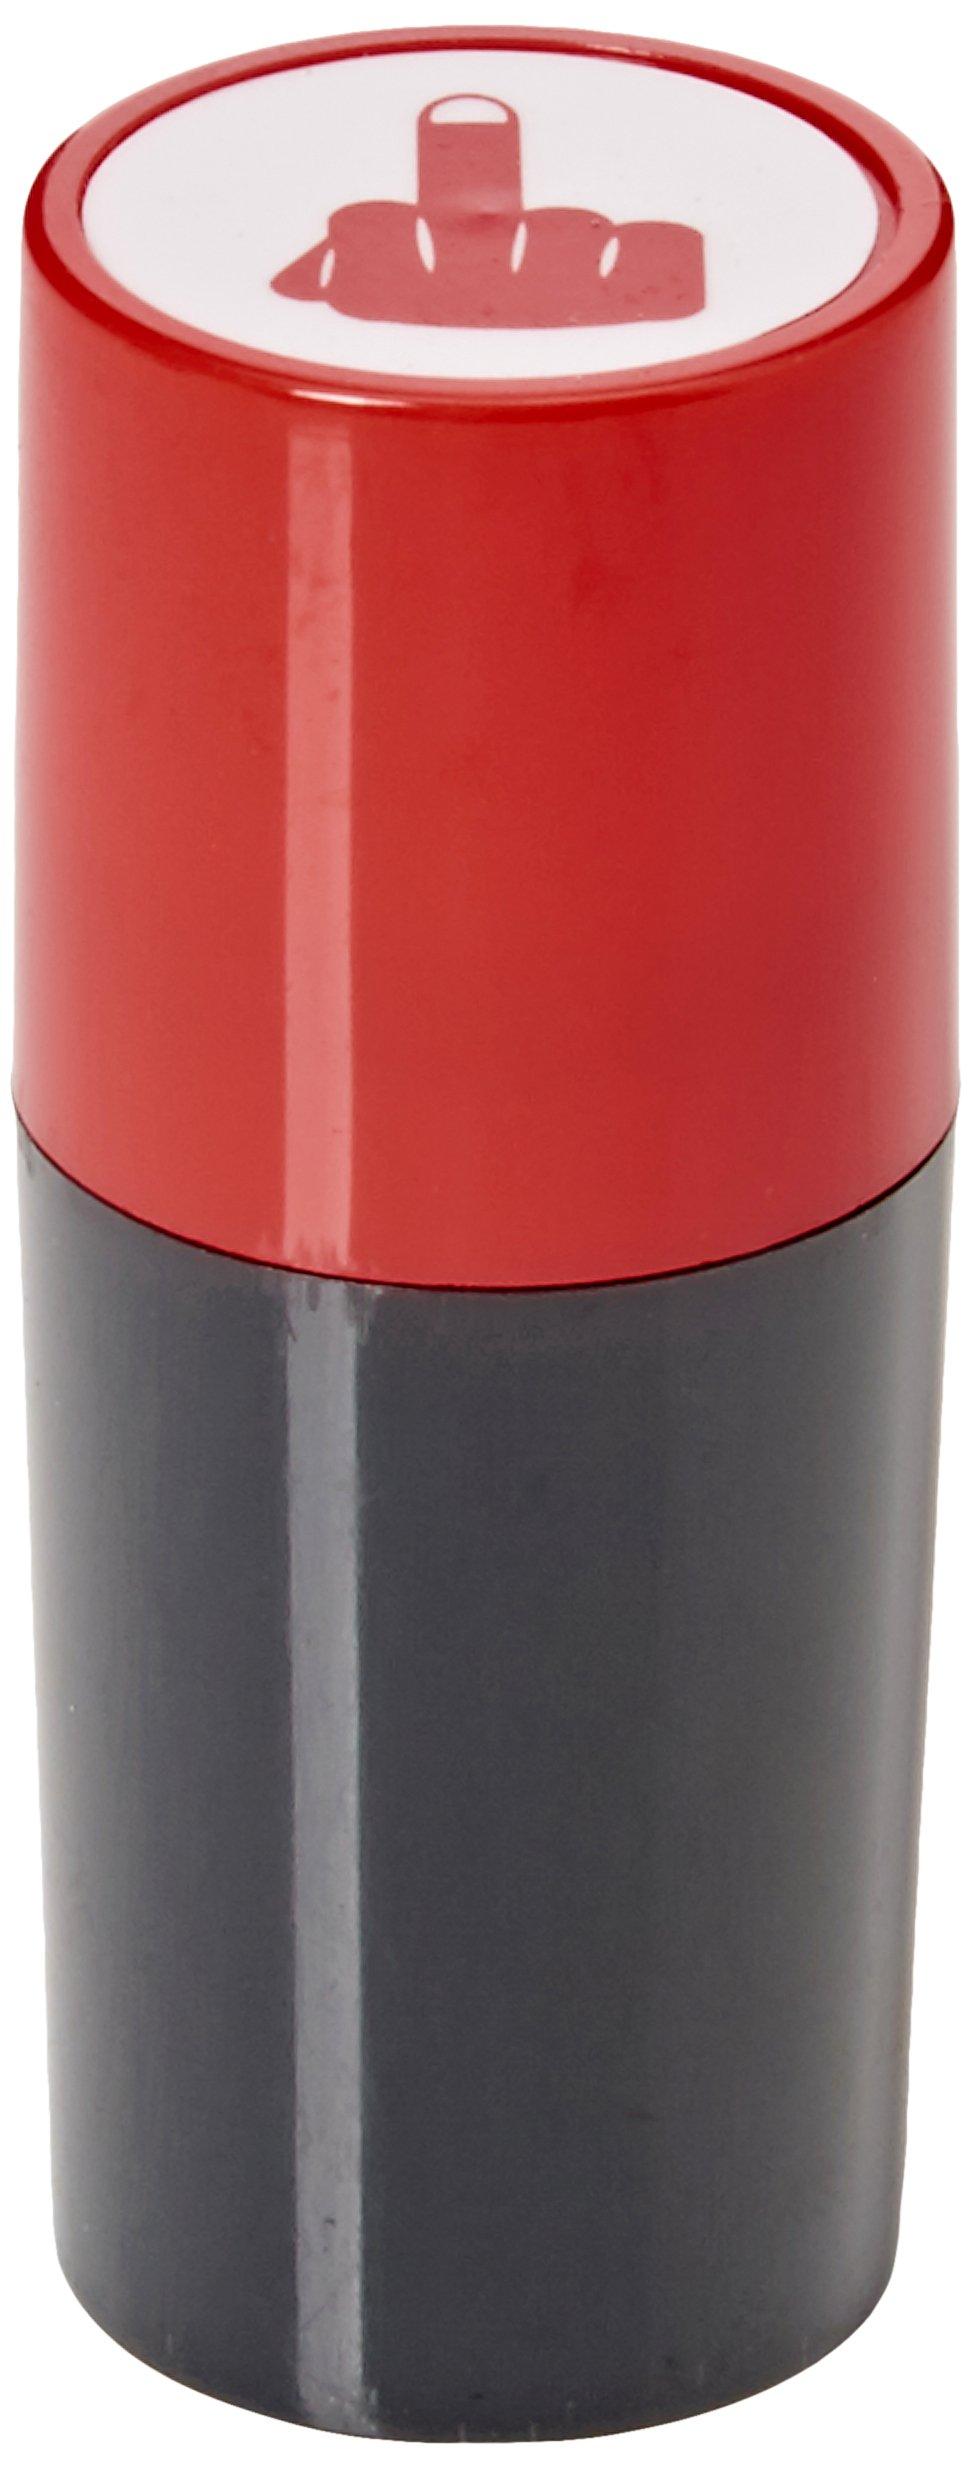 Asbri Golf Finger Ball Stamper - Red by Asbri Golf